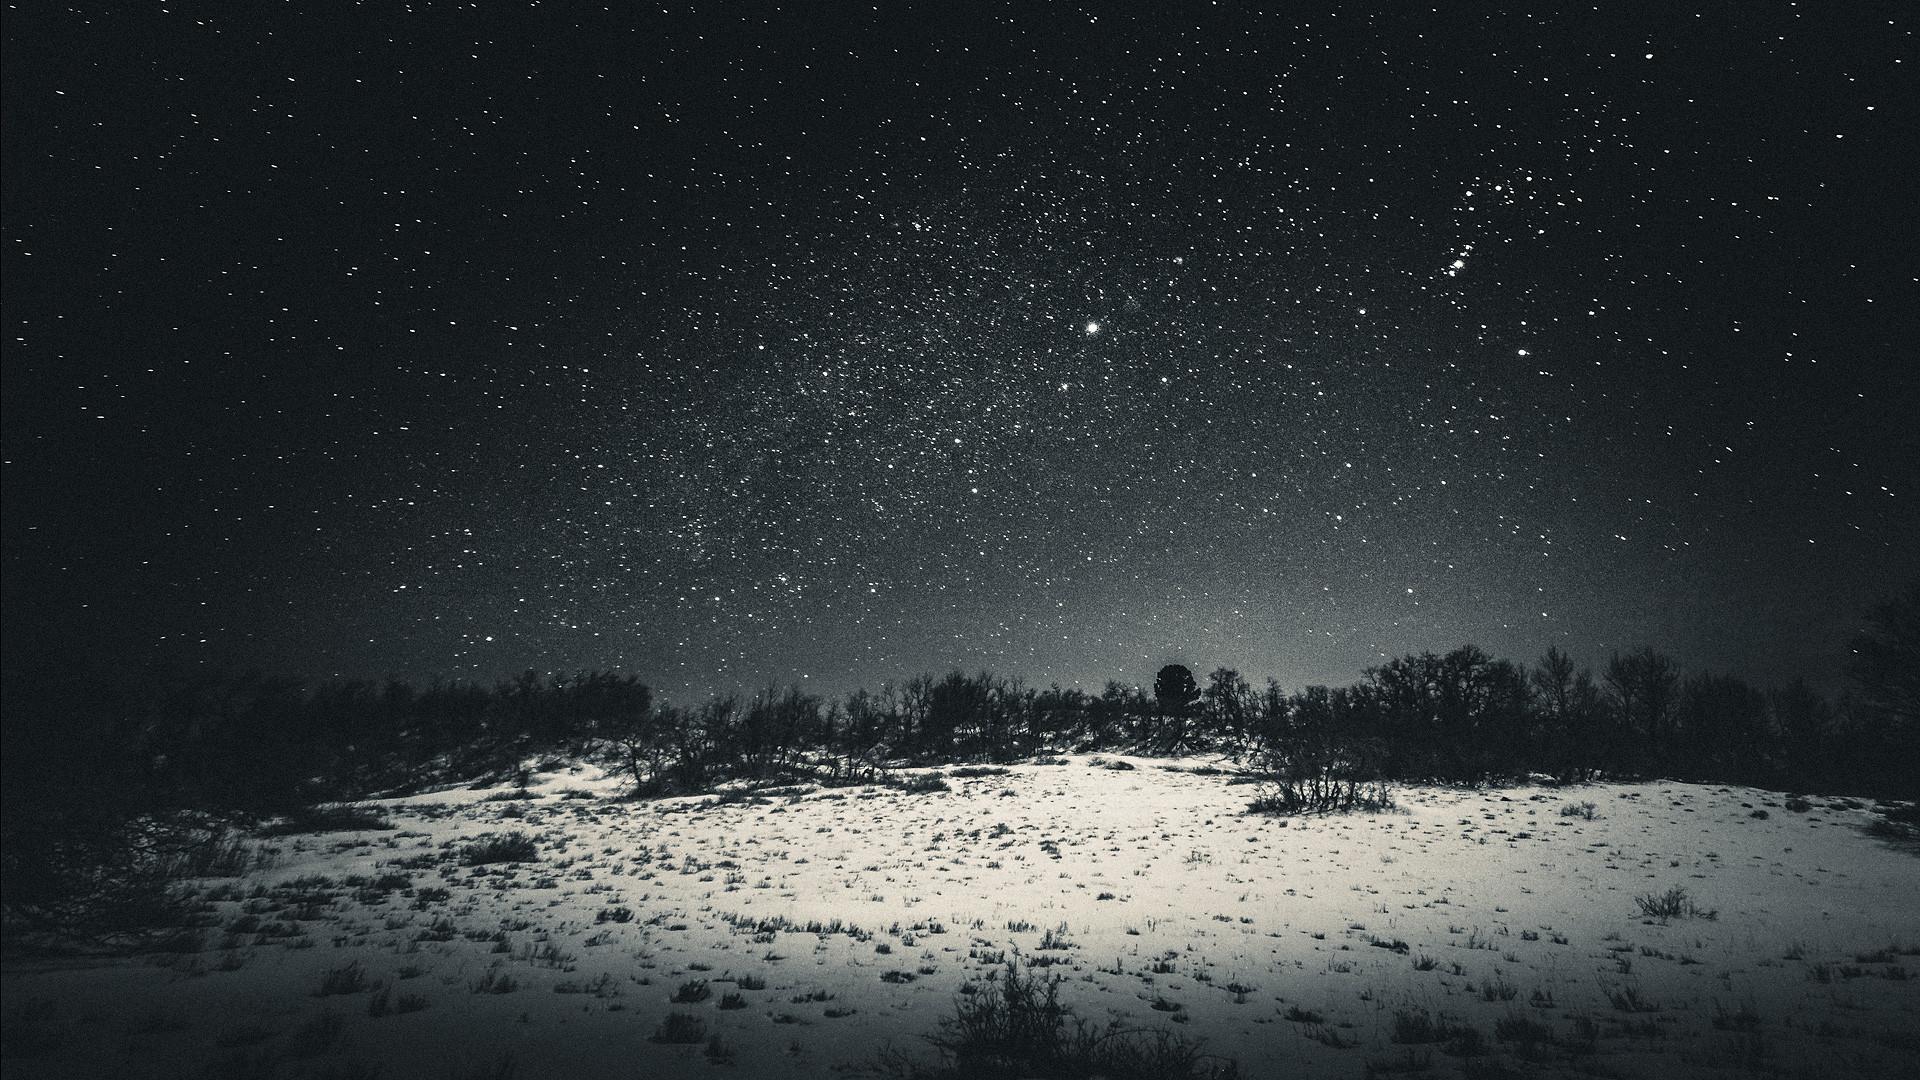 Night Sky Dark Star Lights Tree Nature Iphone 8 Wallpaper - Dark Snow , HD Wallpaper & Backgrounds